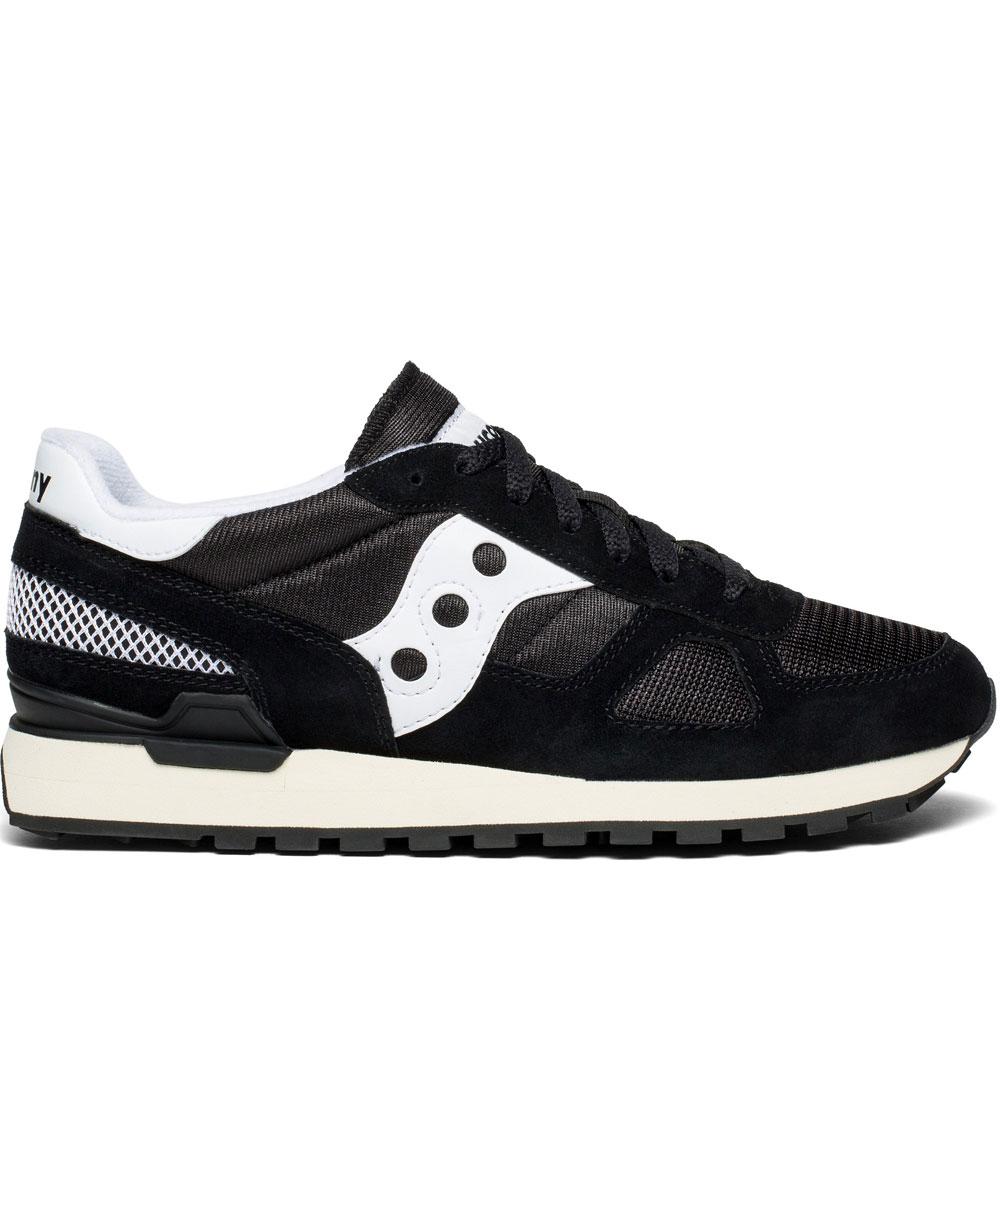 promo code d688b 8c6fa Men's Shadow Original Vintage Sneakers Shoes Black/White